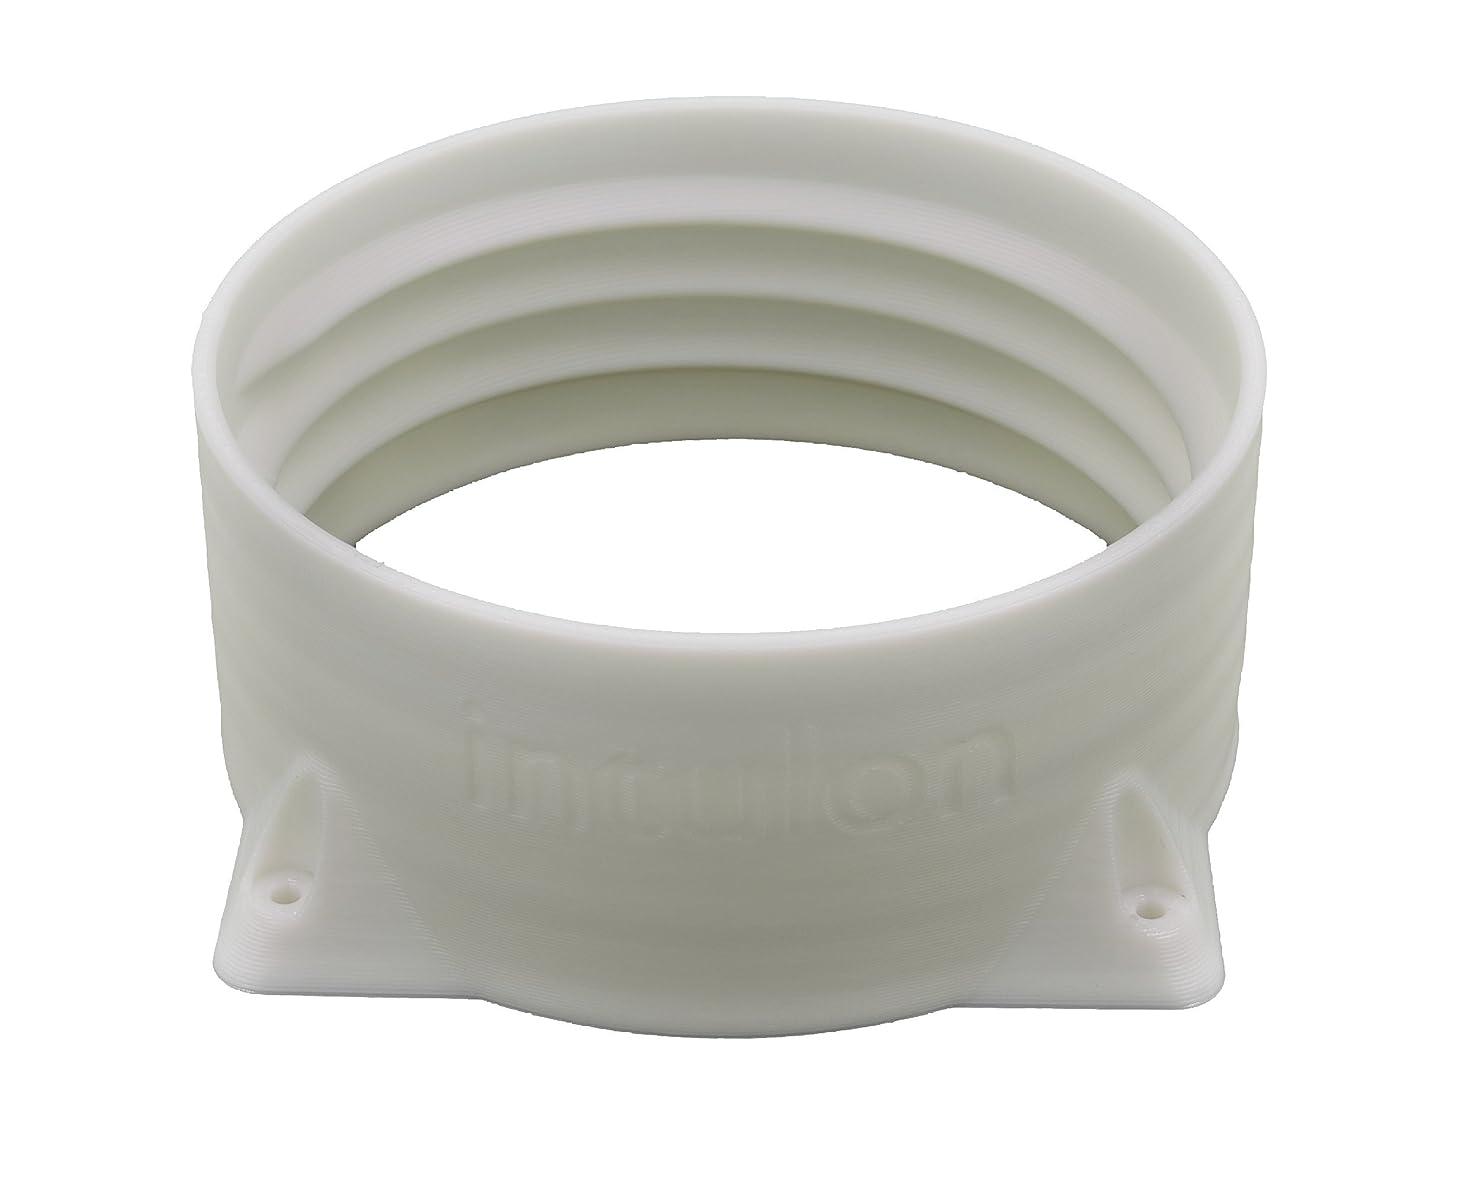 intulon 5-inch Tube Portable AC Air Conditioner Exhaust Hose Flange Wall Mount - Clockwise Thread 5CWMOUNT iuunibgizpqdz1